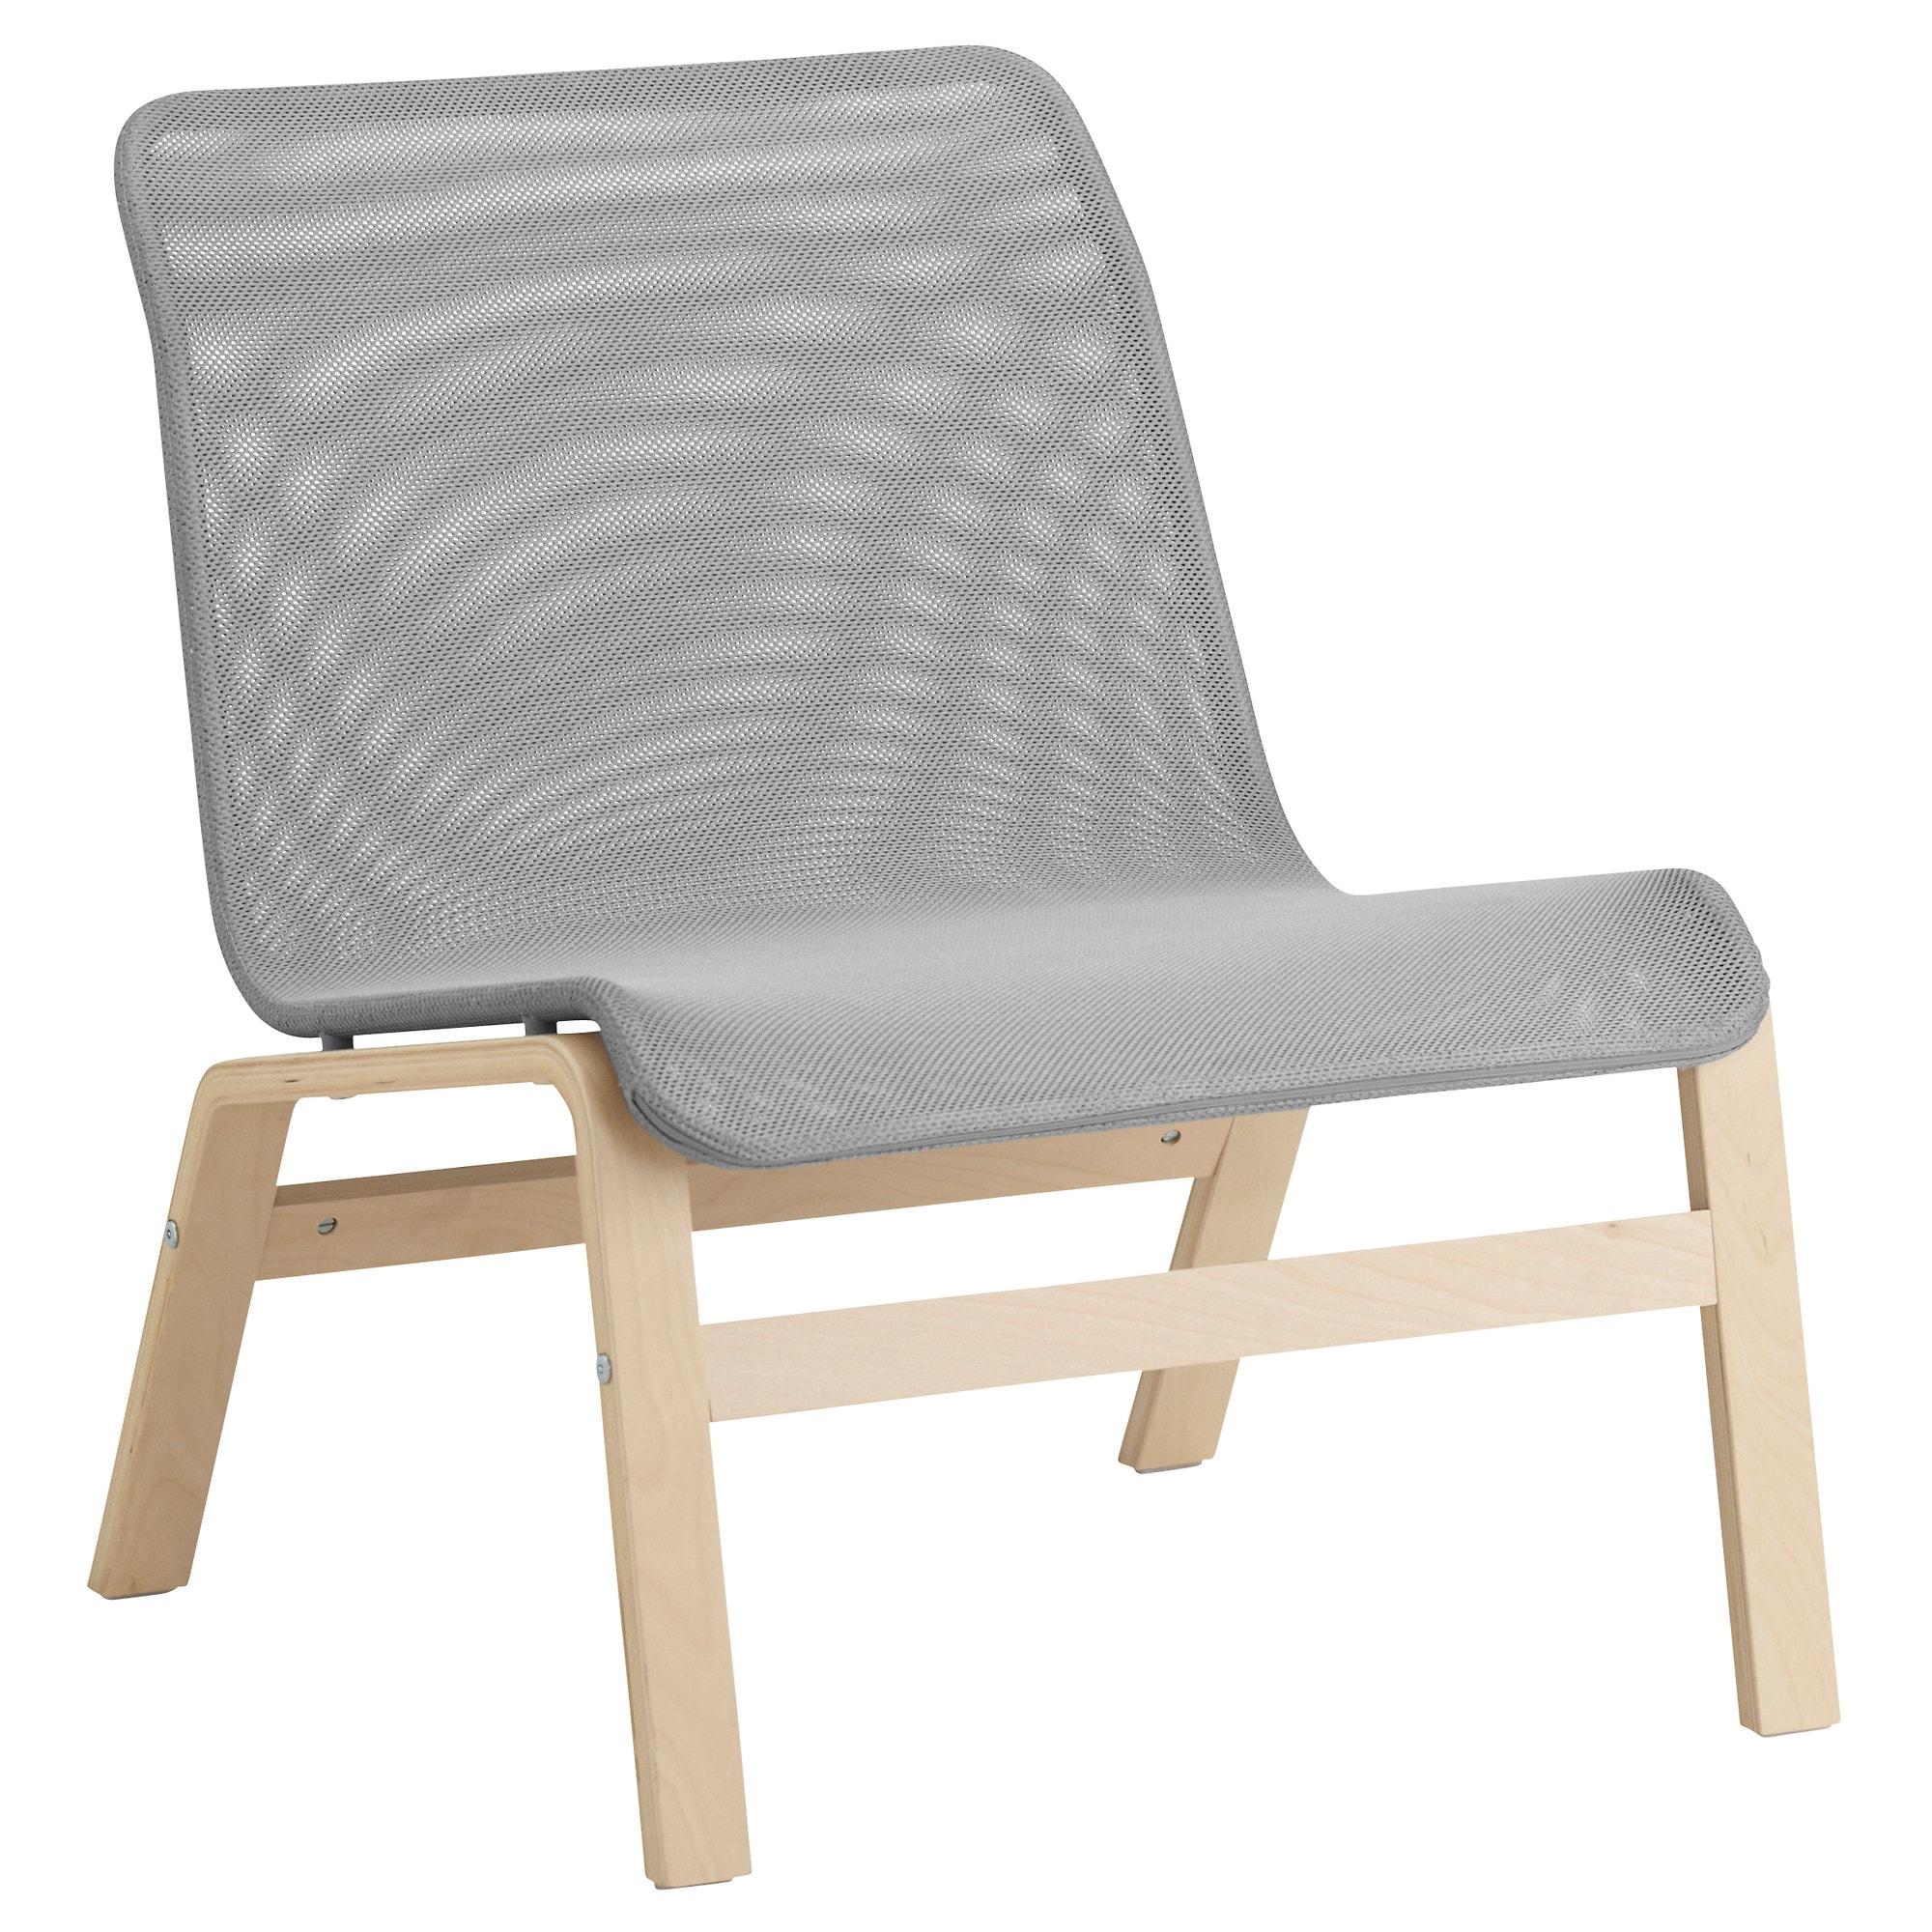 Easychair Irdz Nolmyra Easy Chair Birch Veneer Grey Ikea